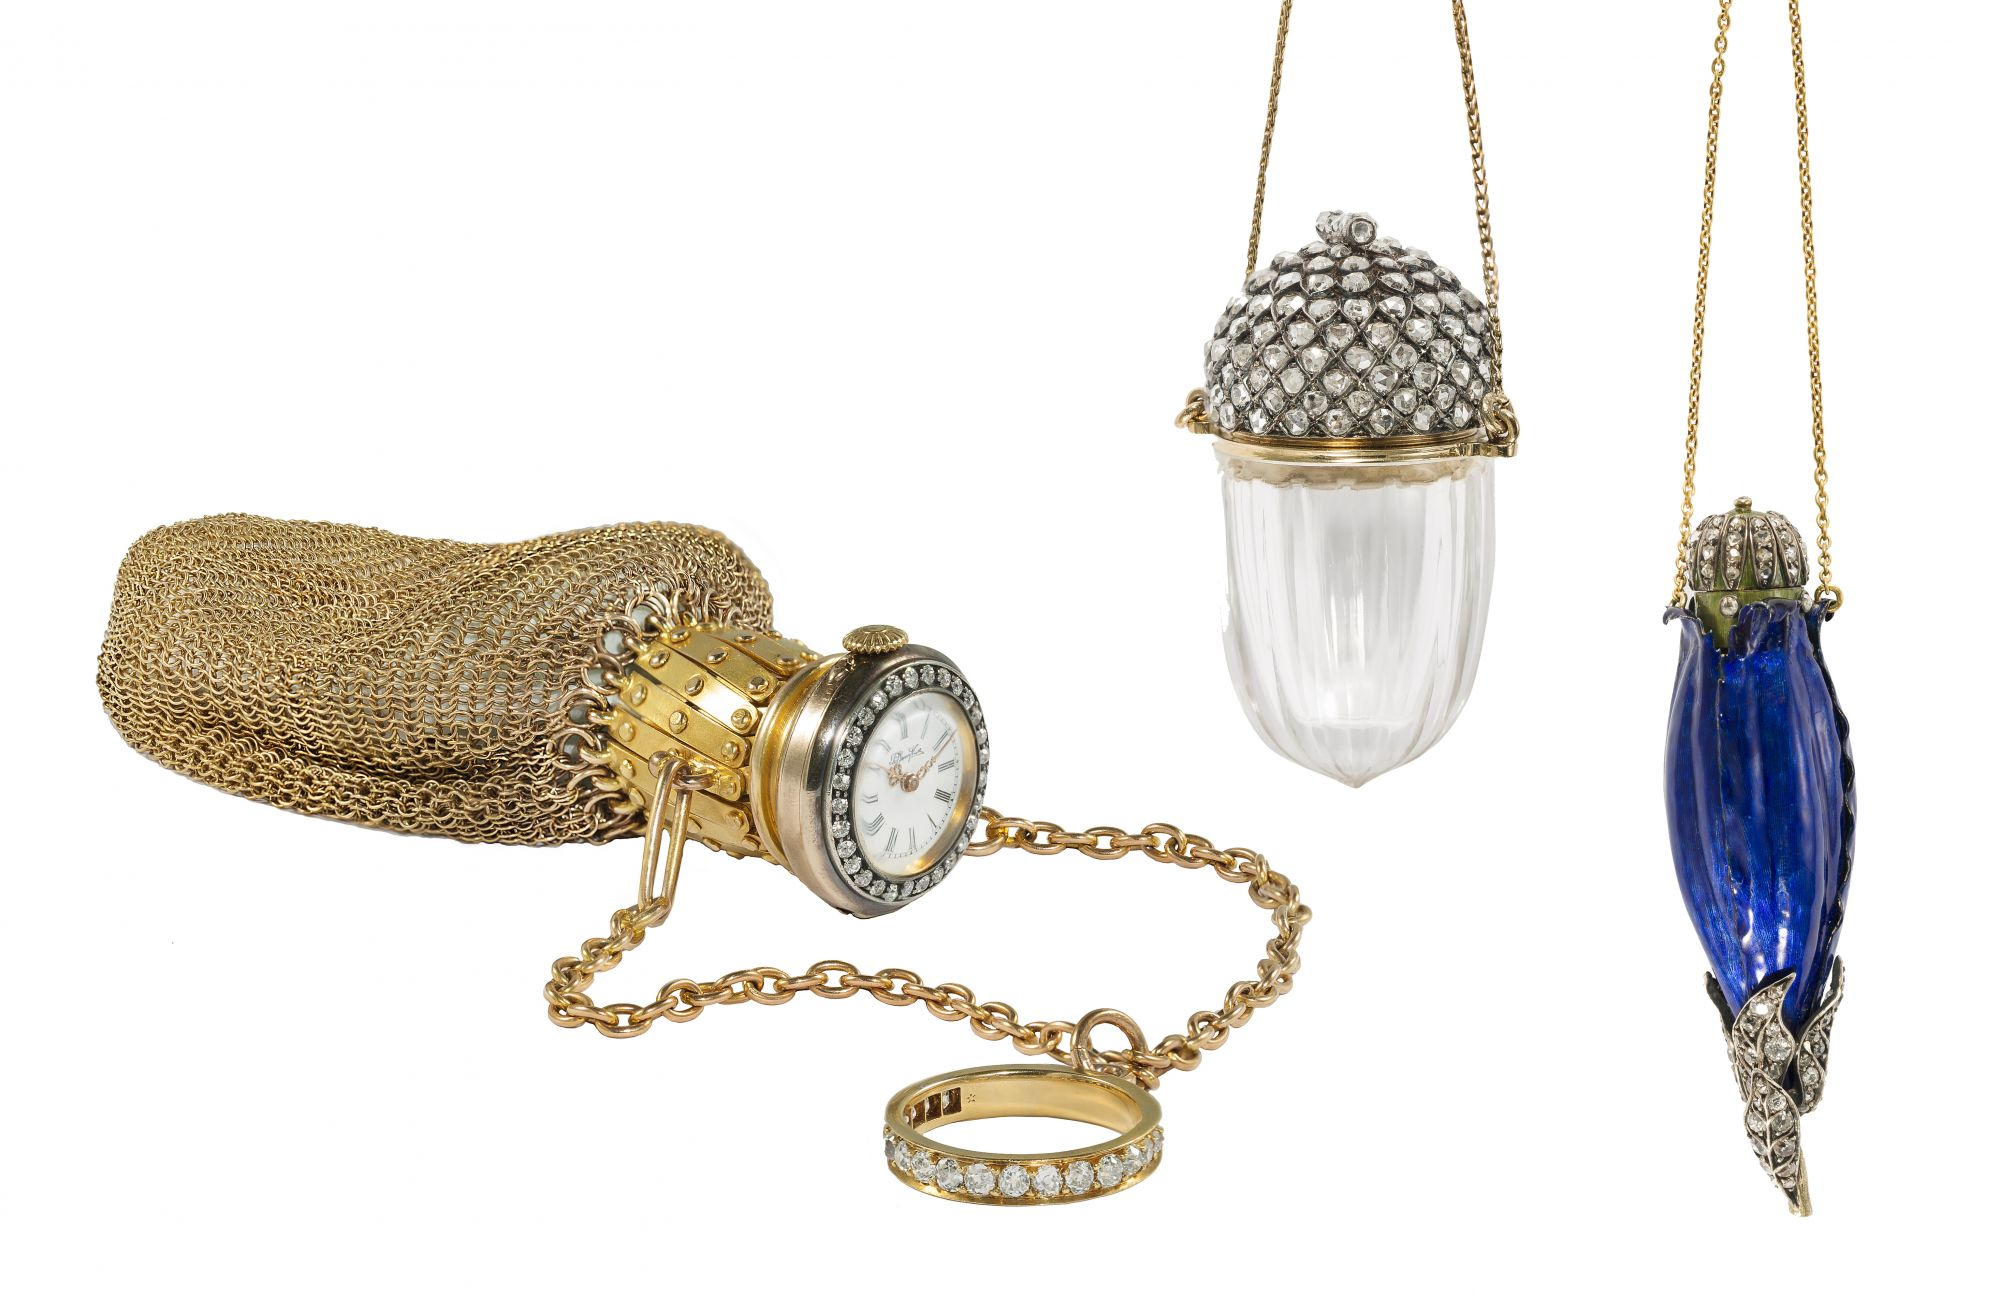 Tatler Treasures:超乎想像的珠寶訂單!鳥籠、冰桶還有鑽石梳子⋯⋯名流富豪的珠寶收藏大揭秘